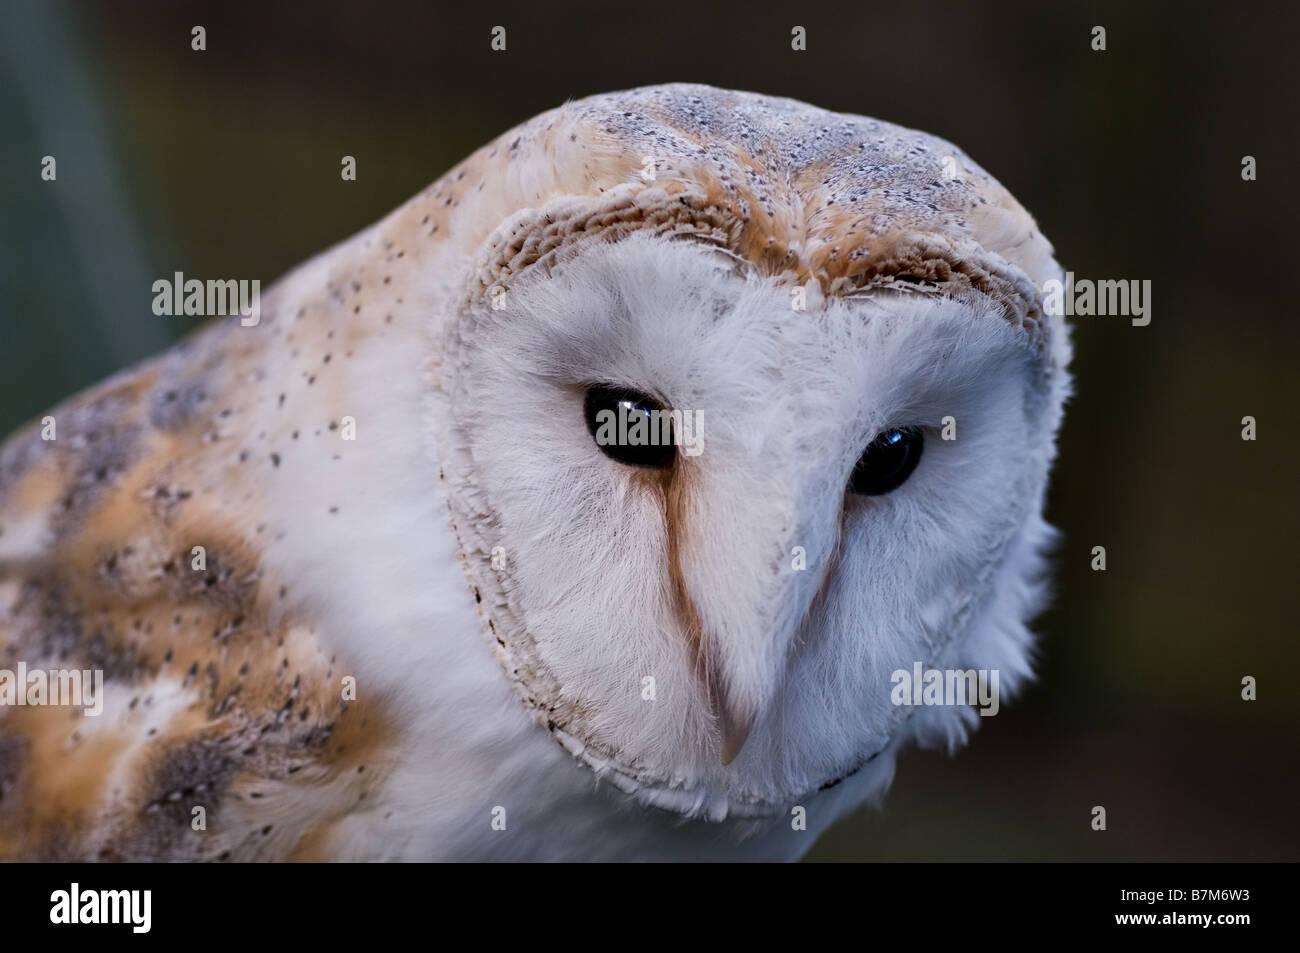 A Barn Owl. - Stock Image